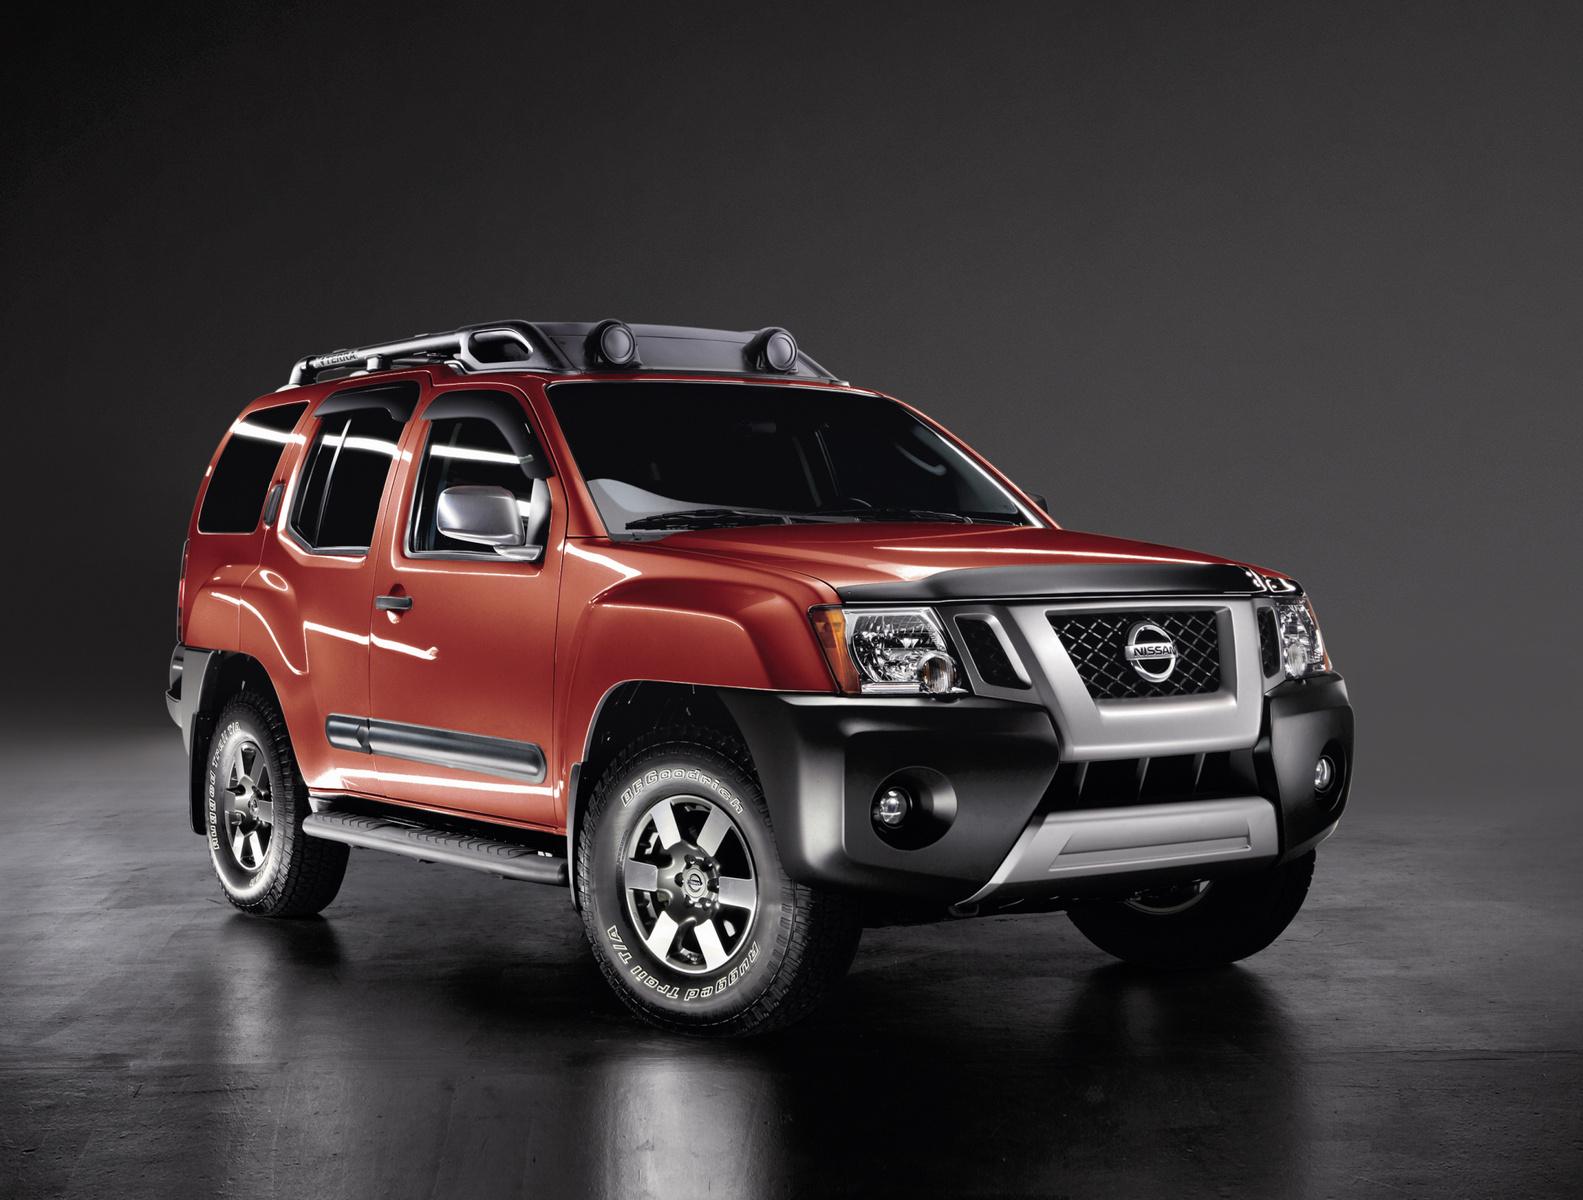 2013 Nissan Xterra - Overview - CarGurus